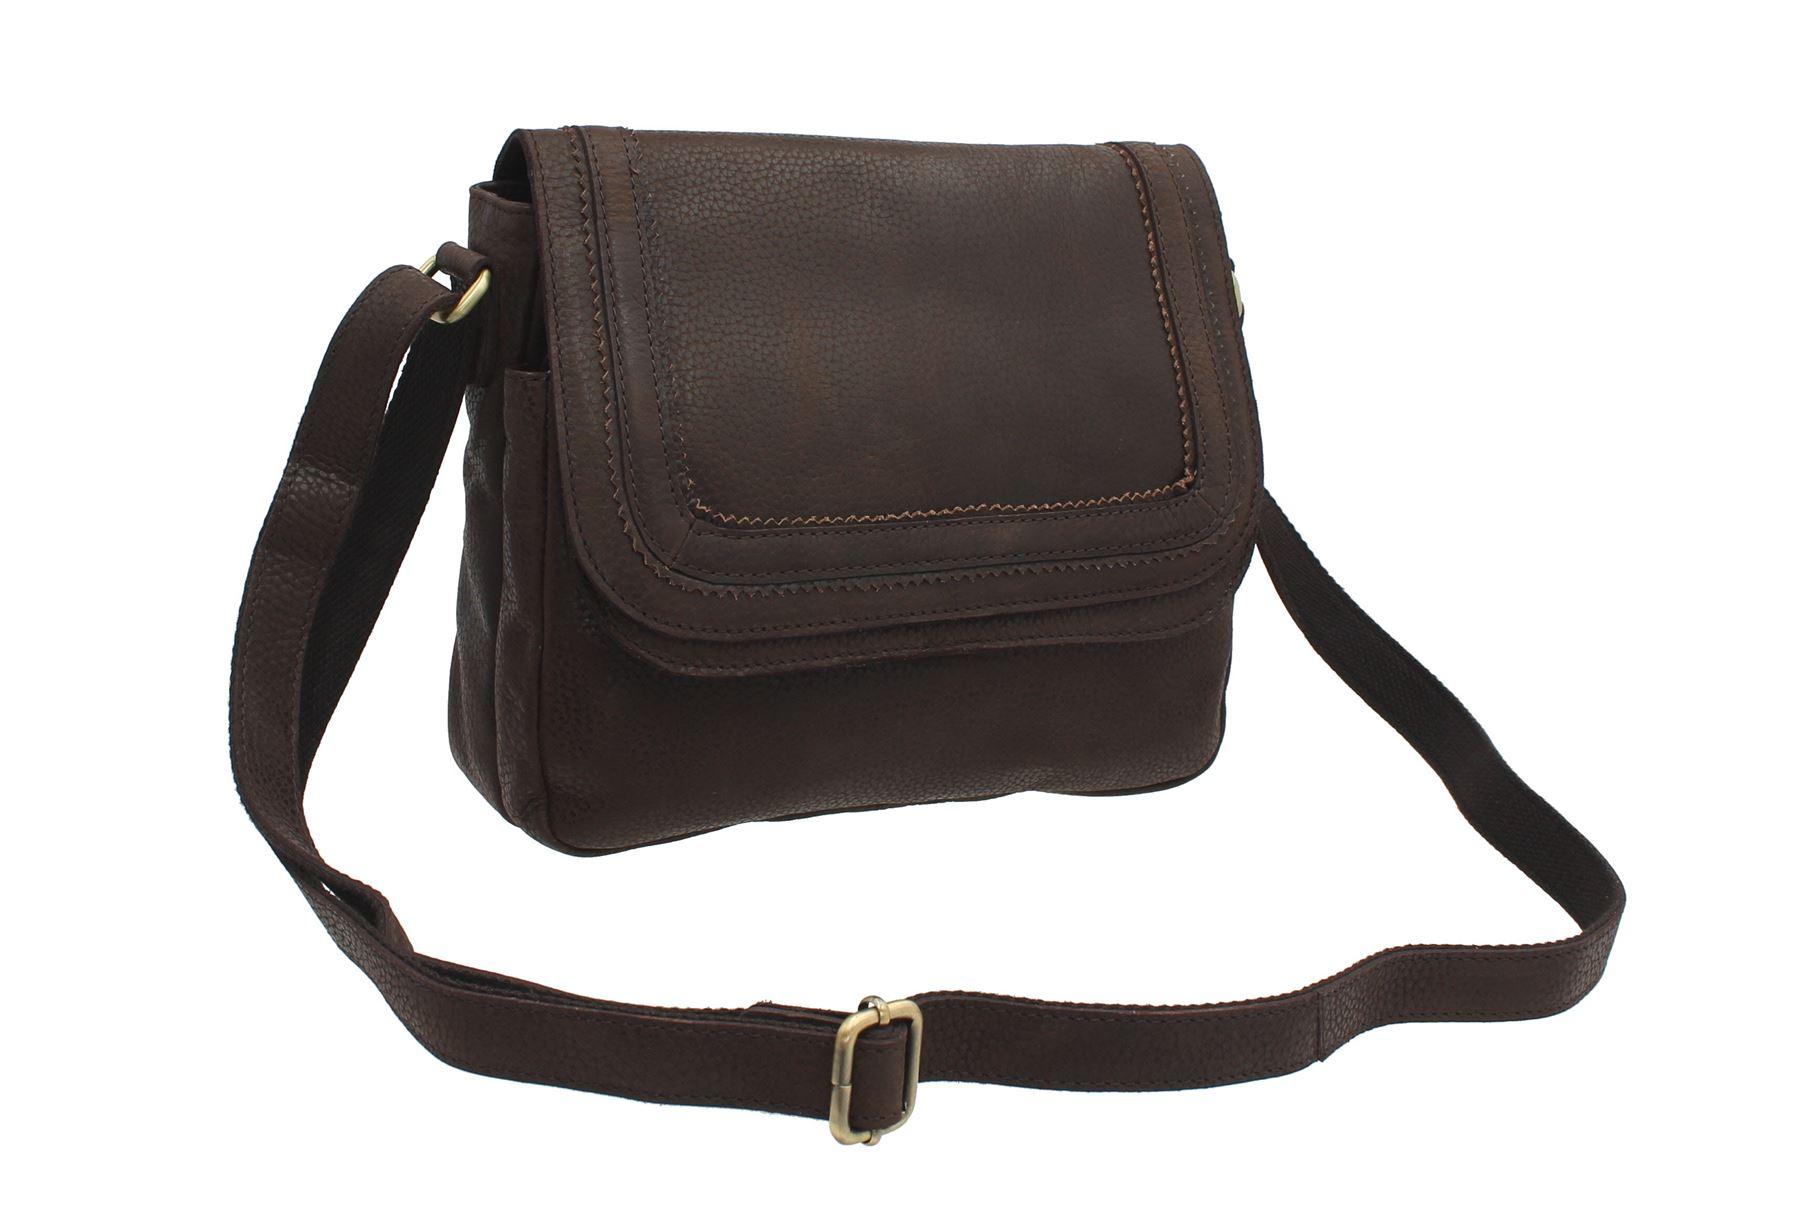 bandolera Bandolera Brown Martha Cambridge marr Bolla Collection Bags vwIxH